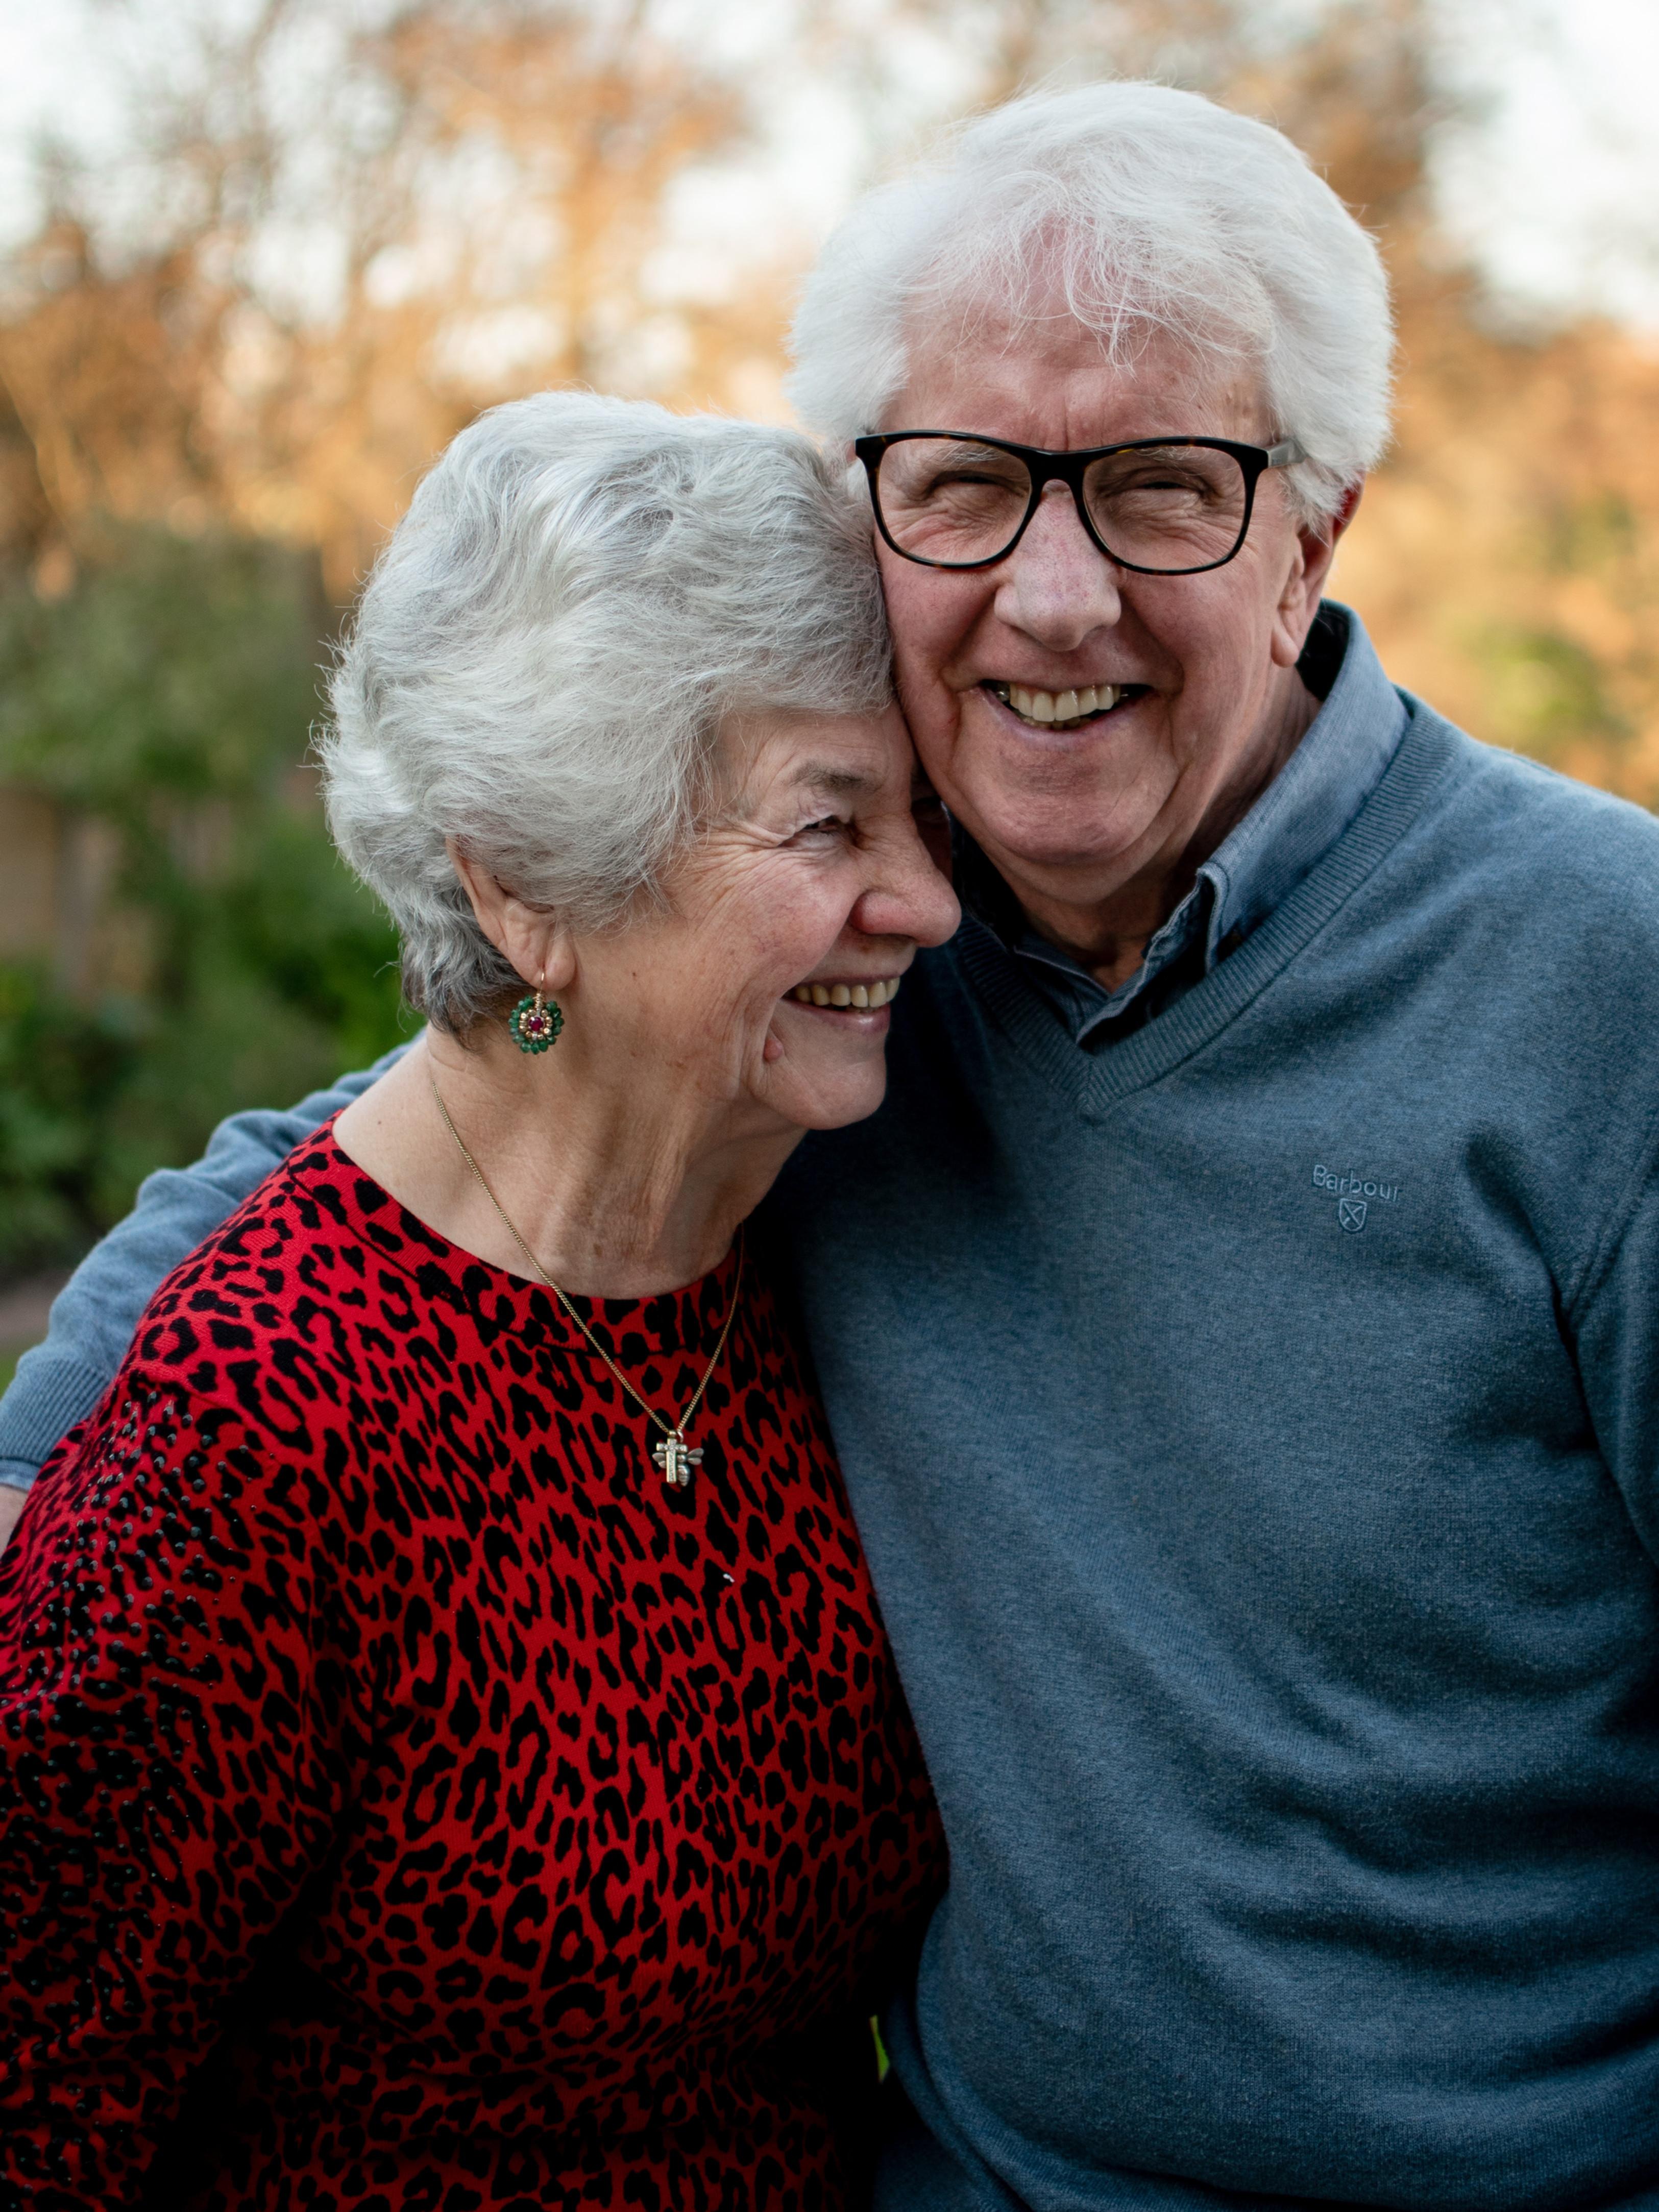 Senior 65+ Tax Filing